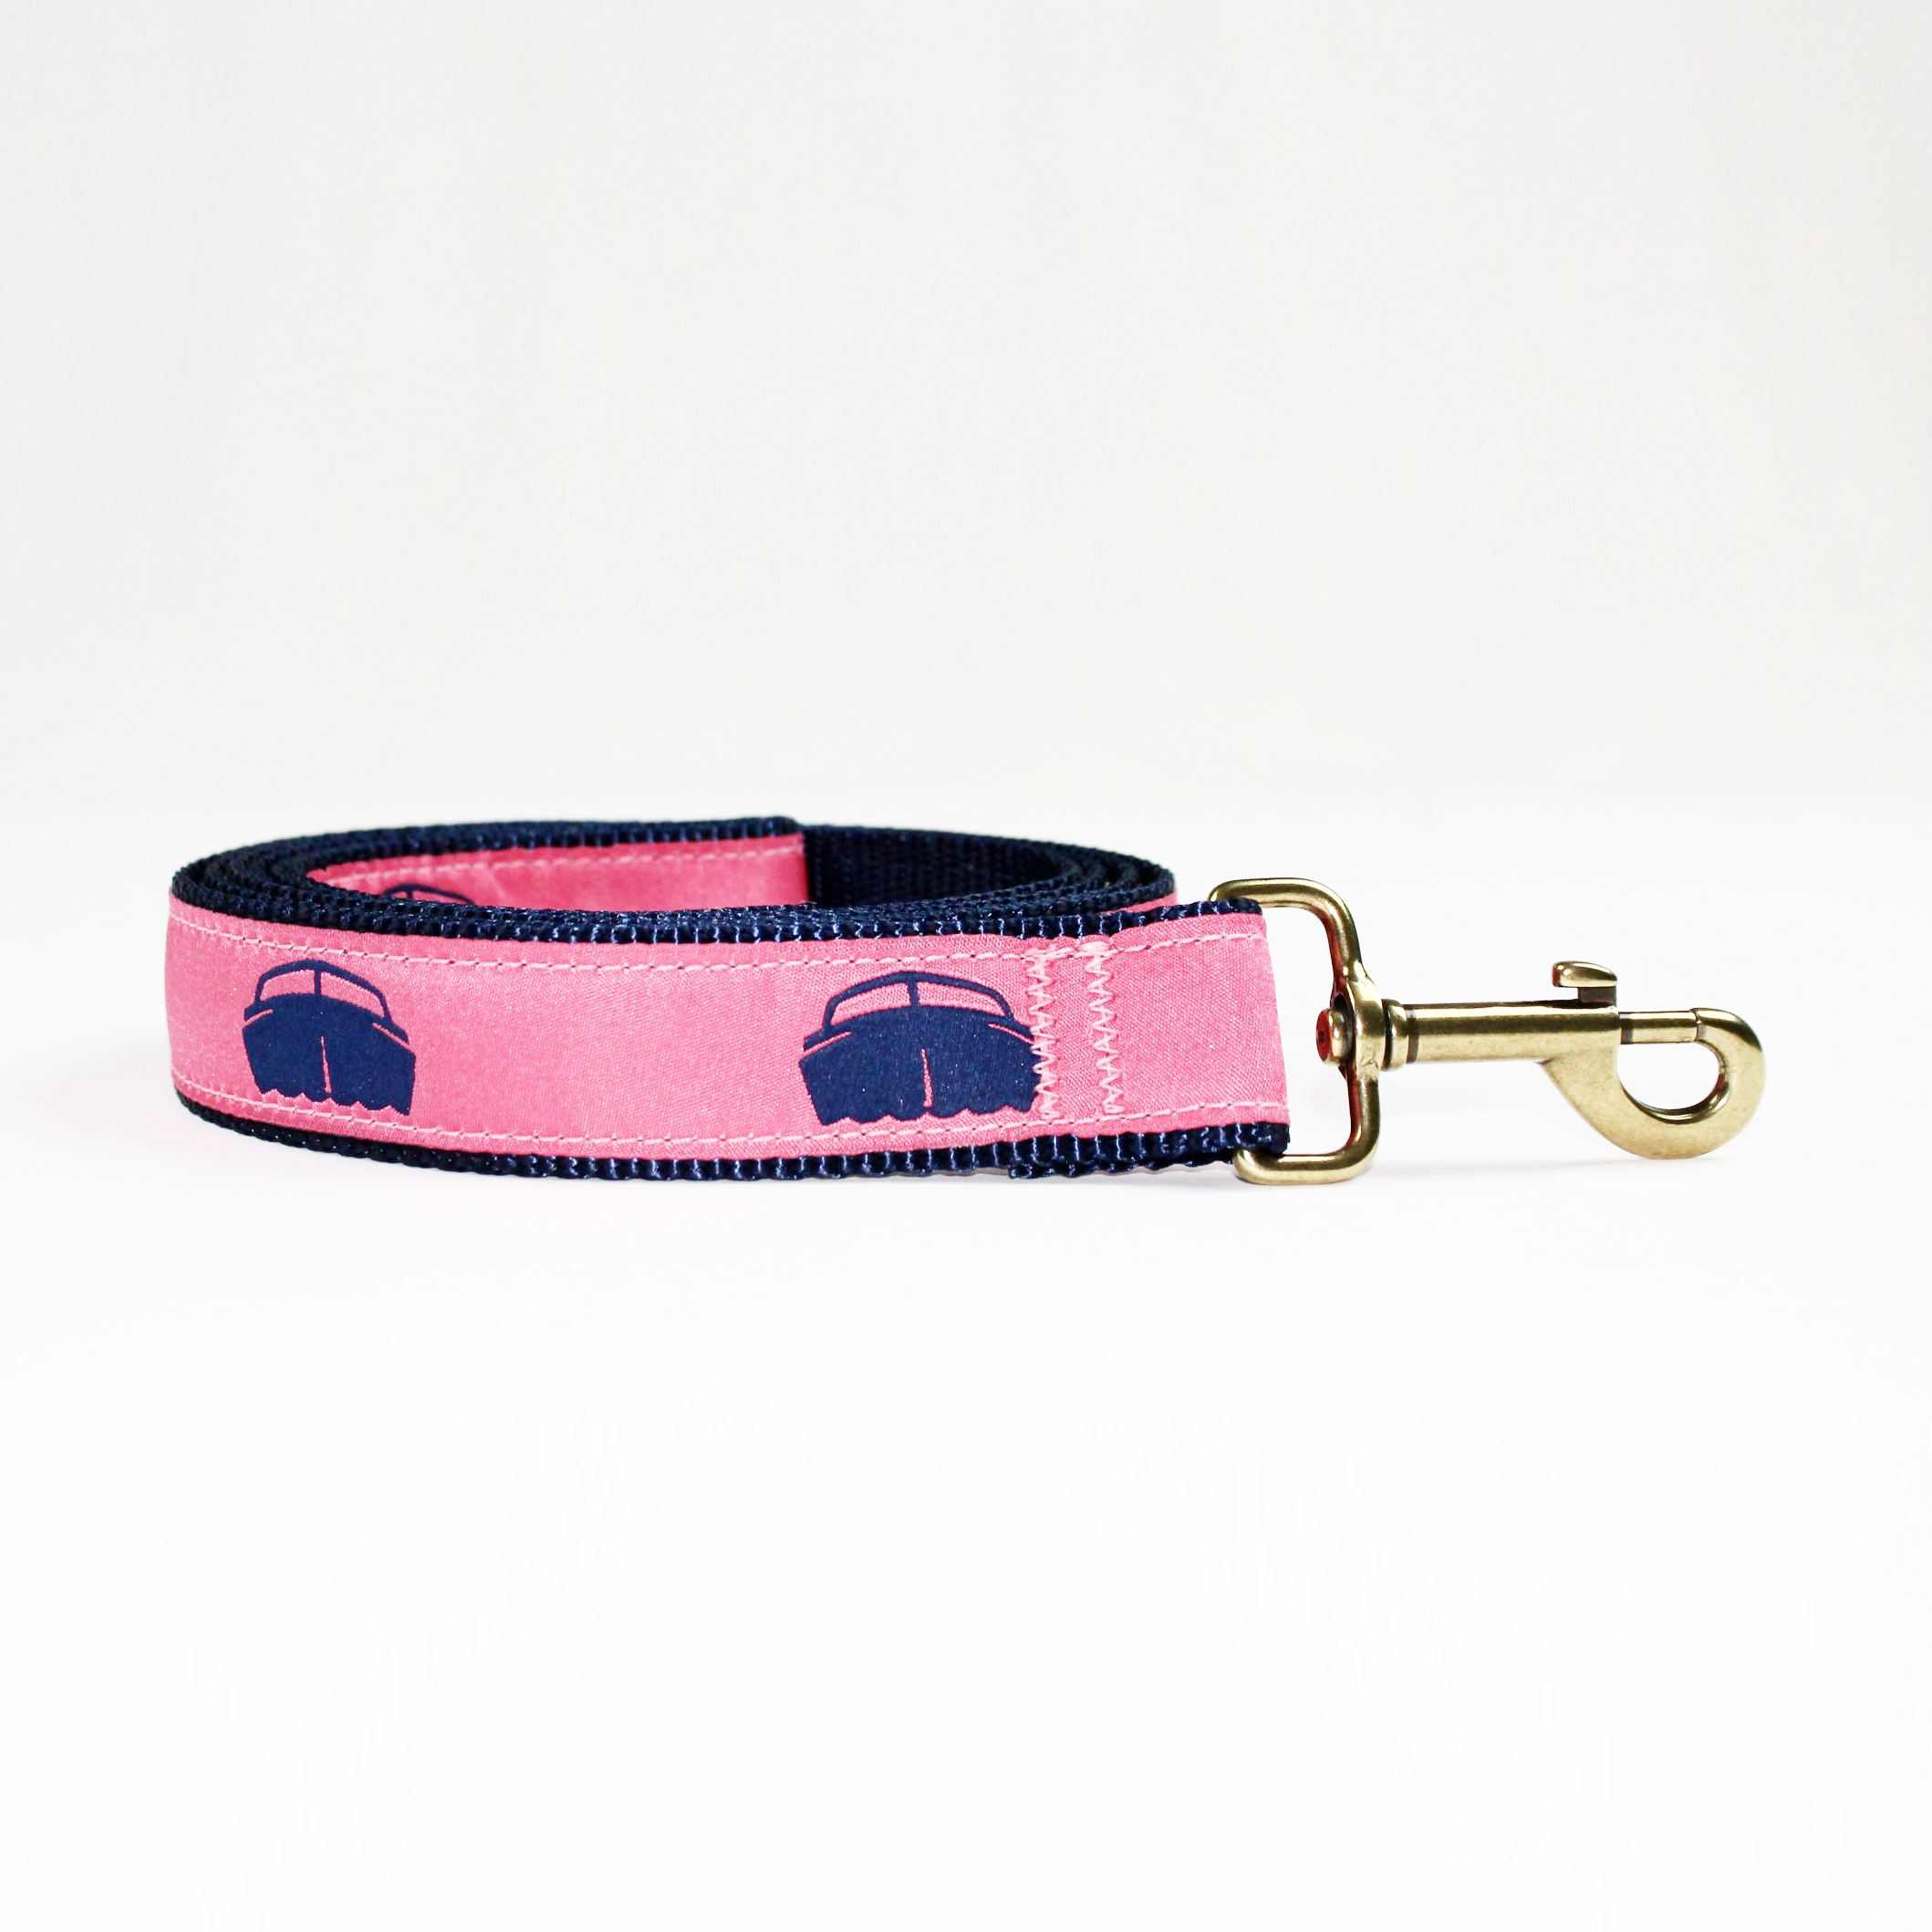 Dog Lead - Navy w/Pink $36